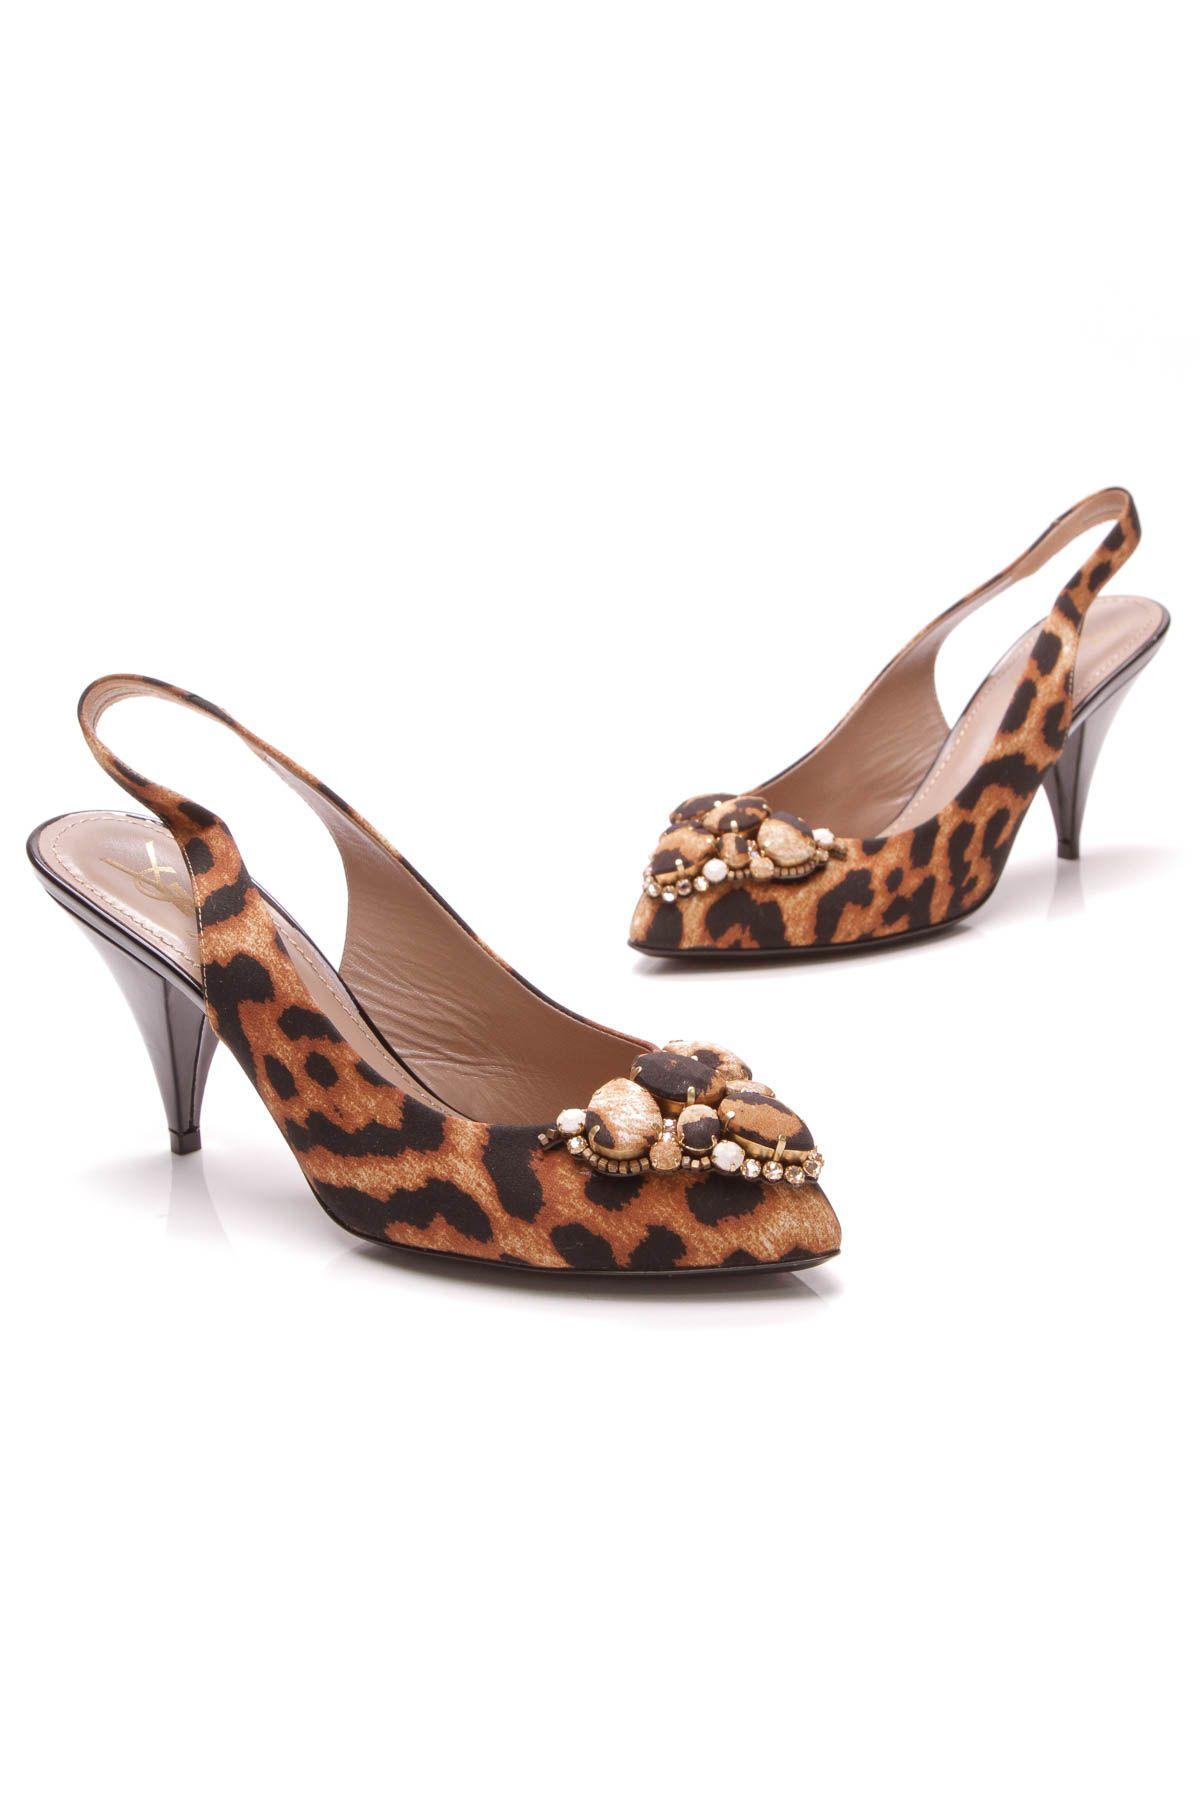 3bcb7a4aa03 Yves Saint Laurent Leopard Embellished Slingback Heels Ysl Heels